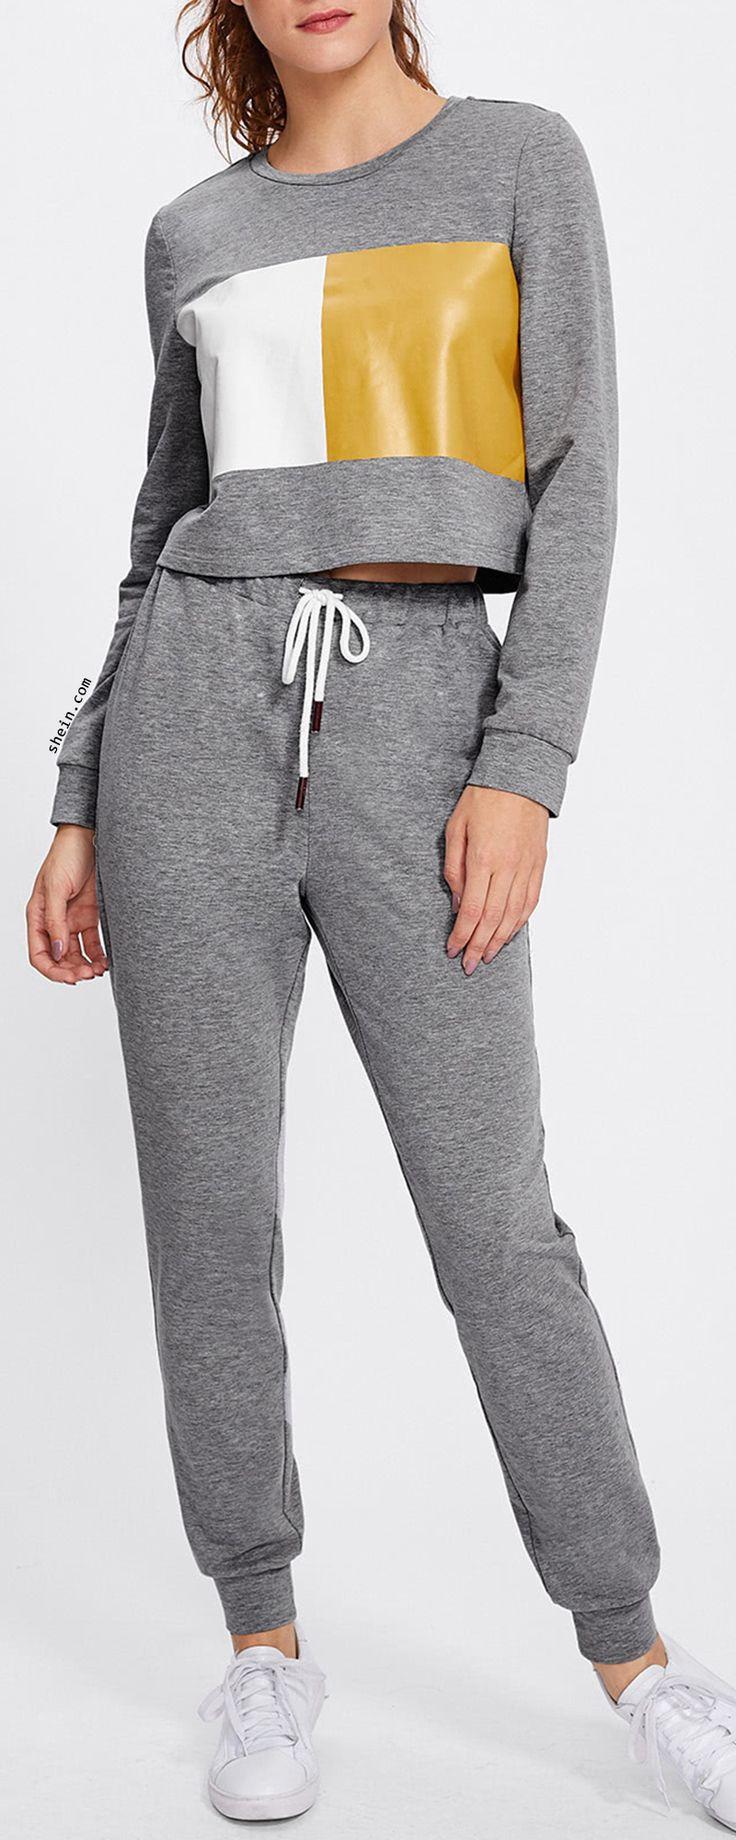 Color Block Marled Sweatshirt & Sweatpants Set